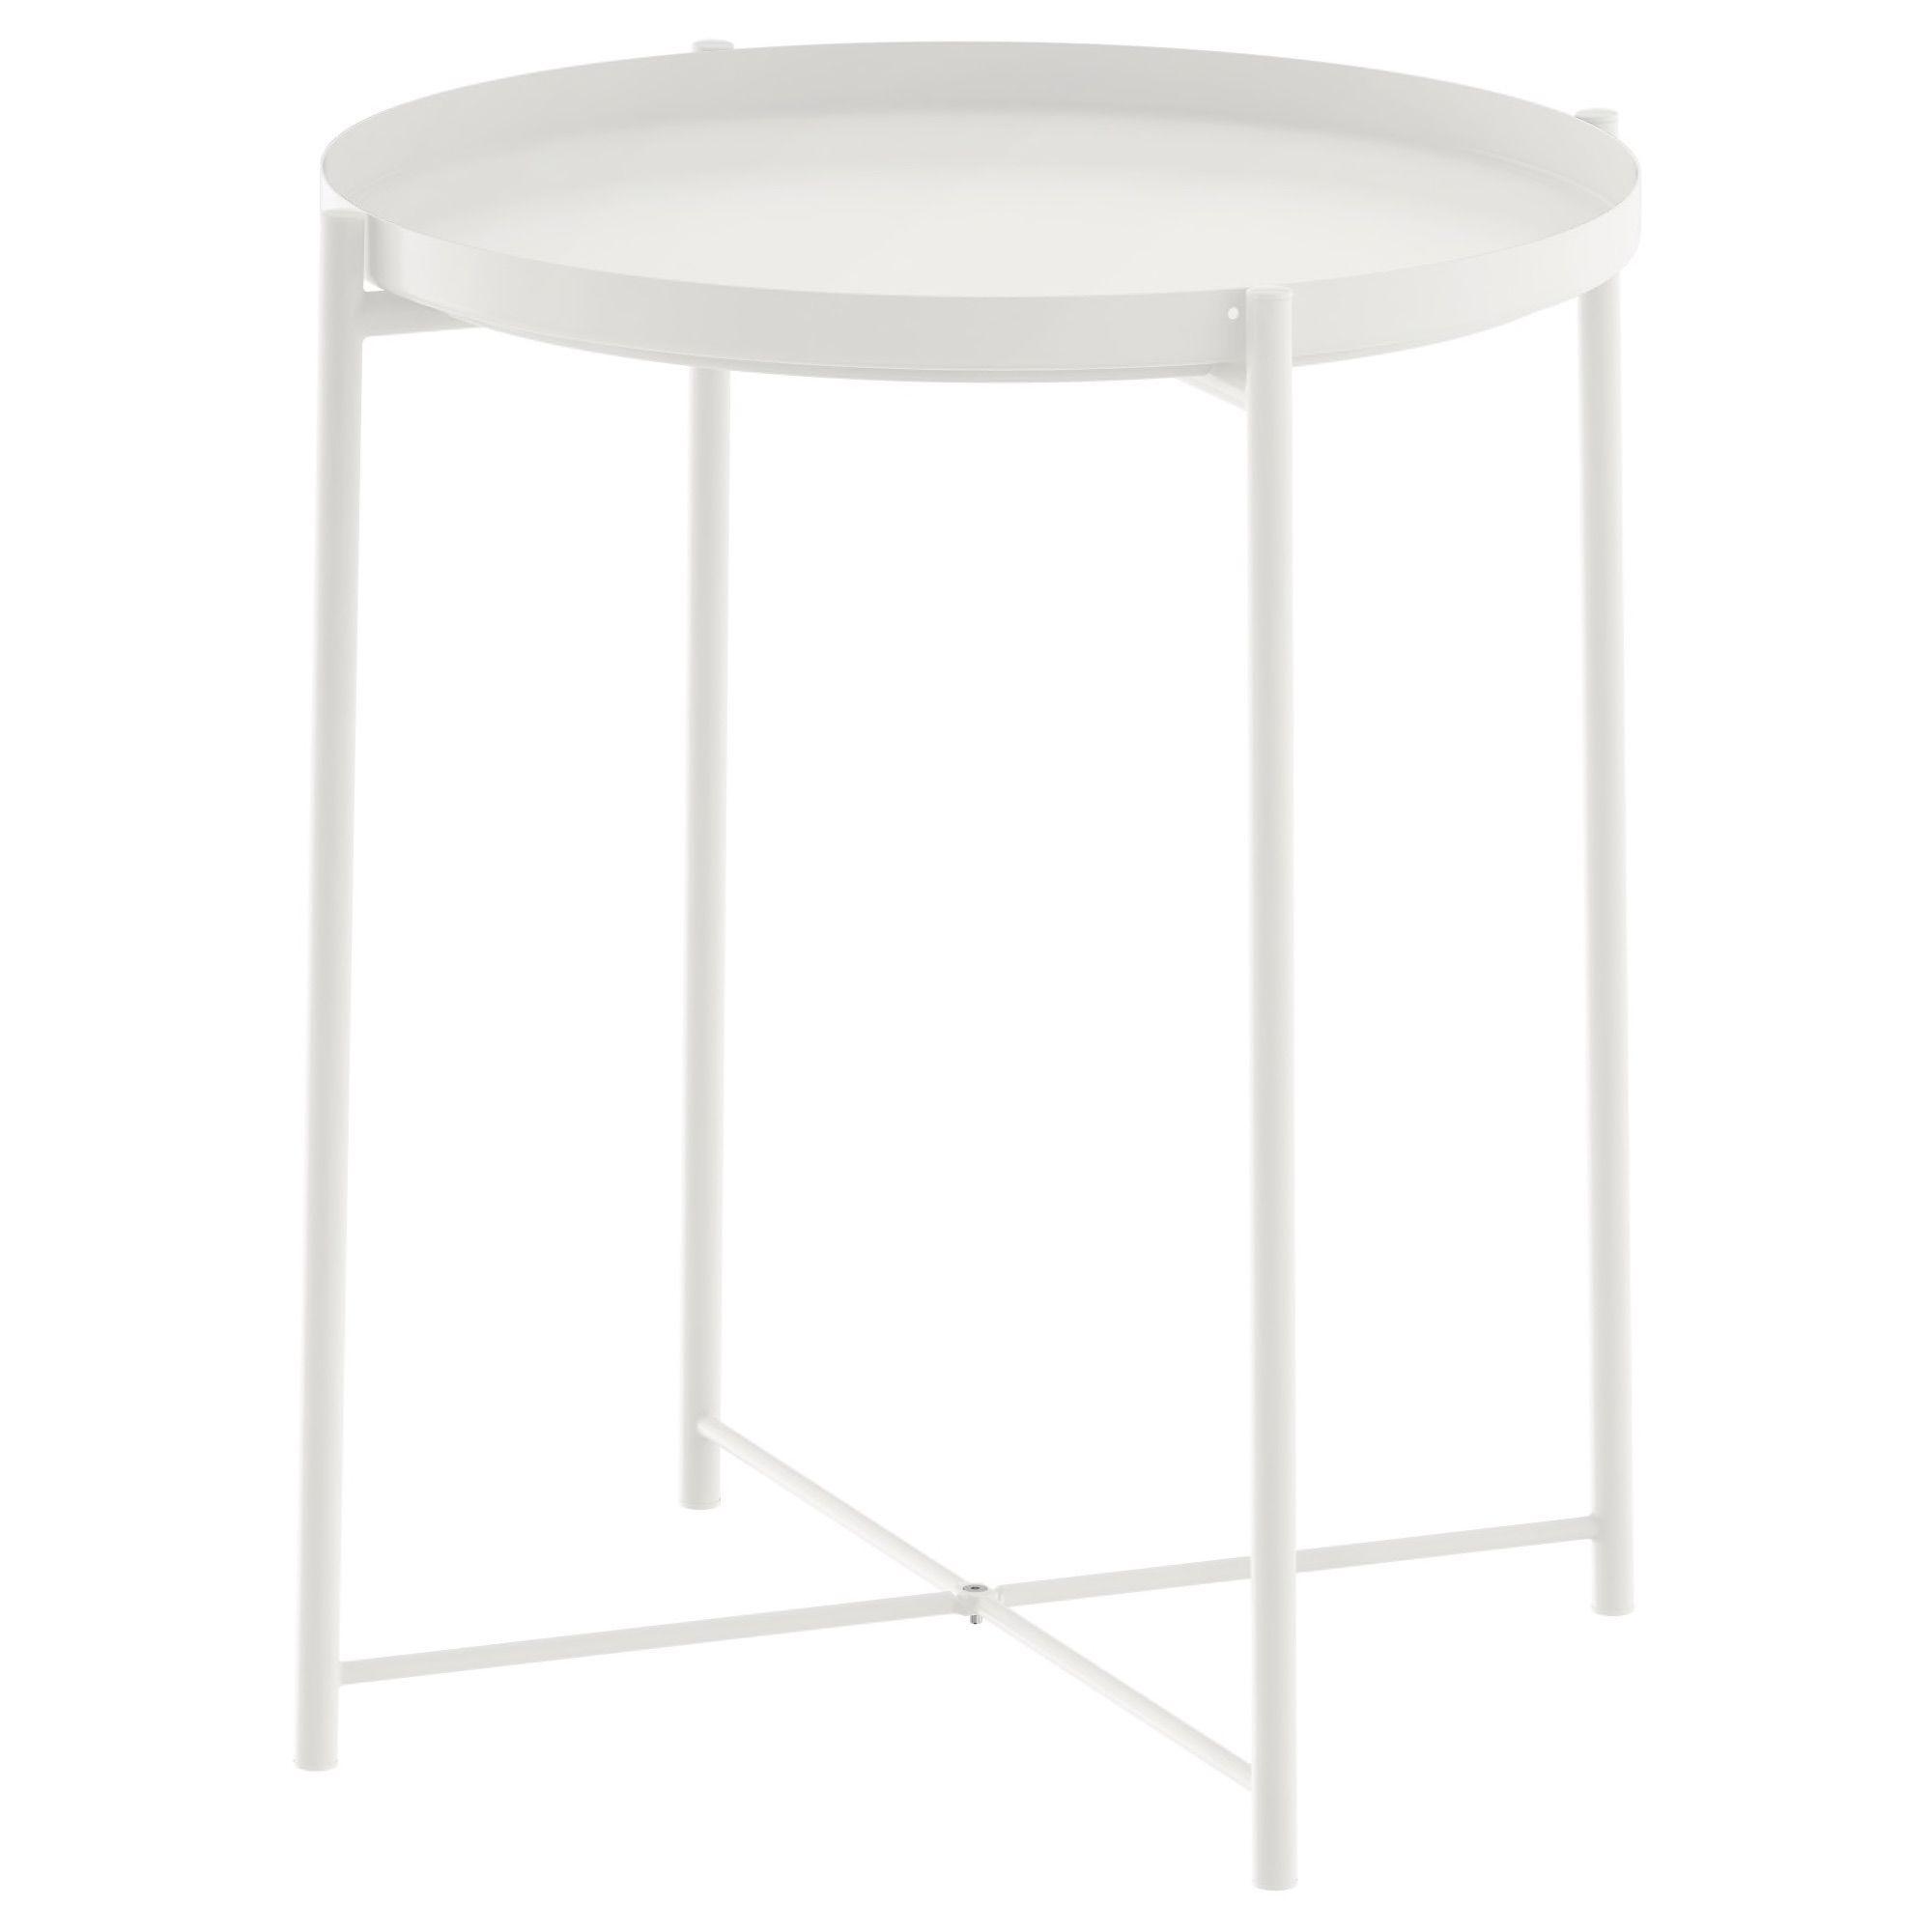 Gladom White Tray Table